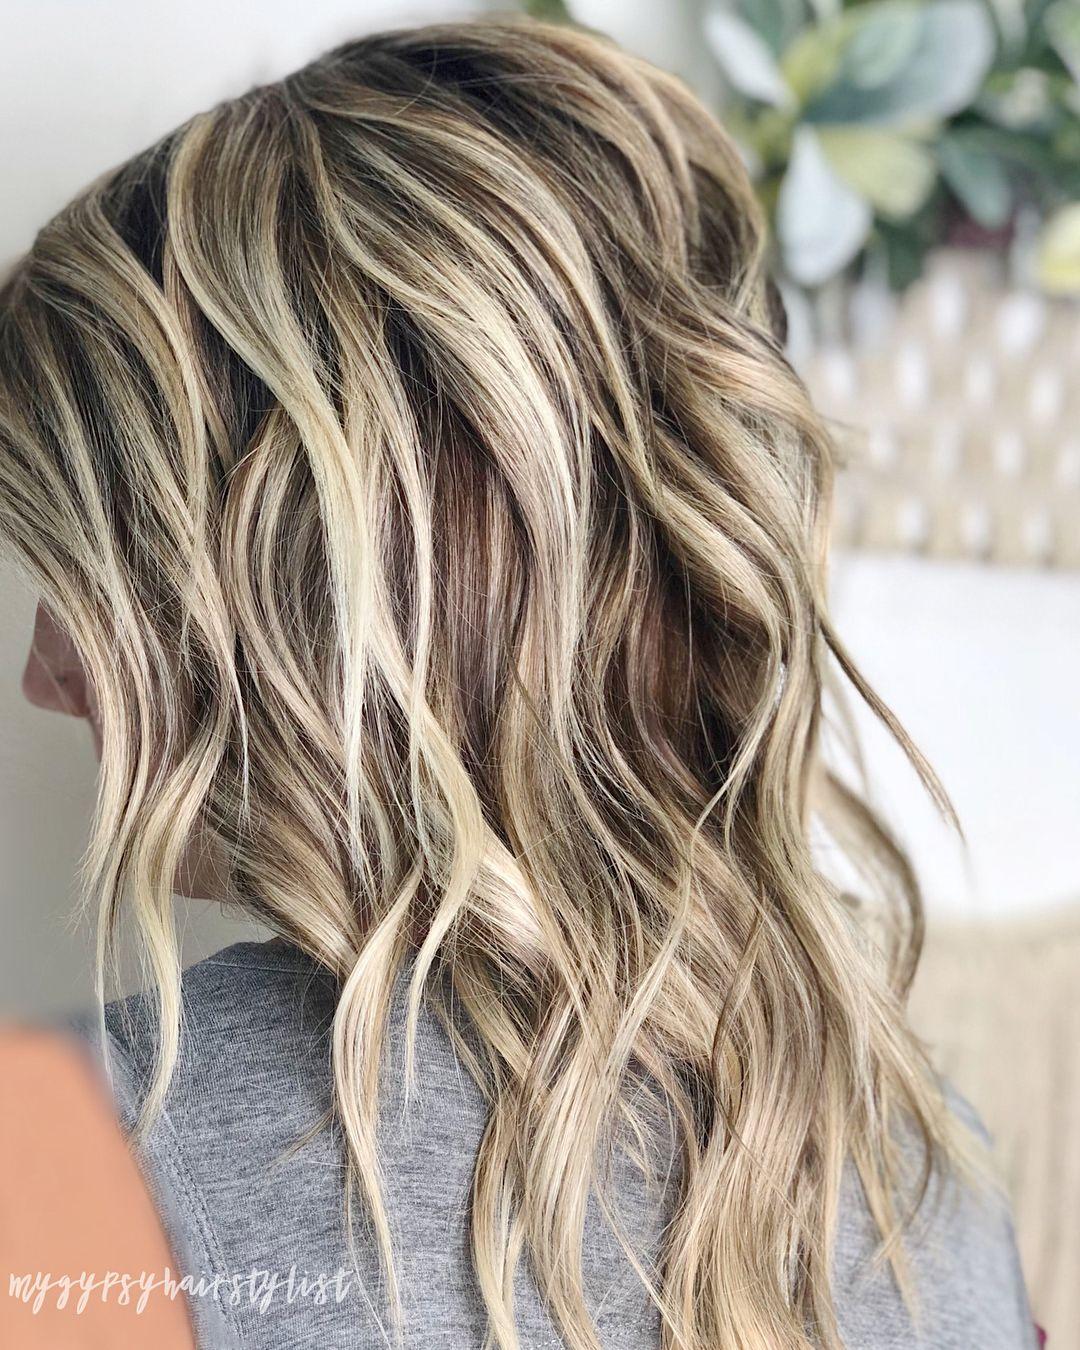 Dimensional blonde hair inspiration ashy blonde medium length